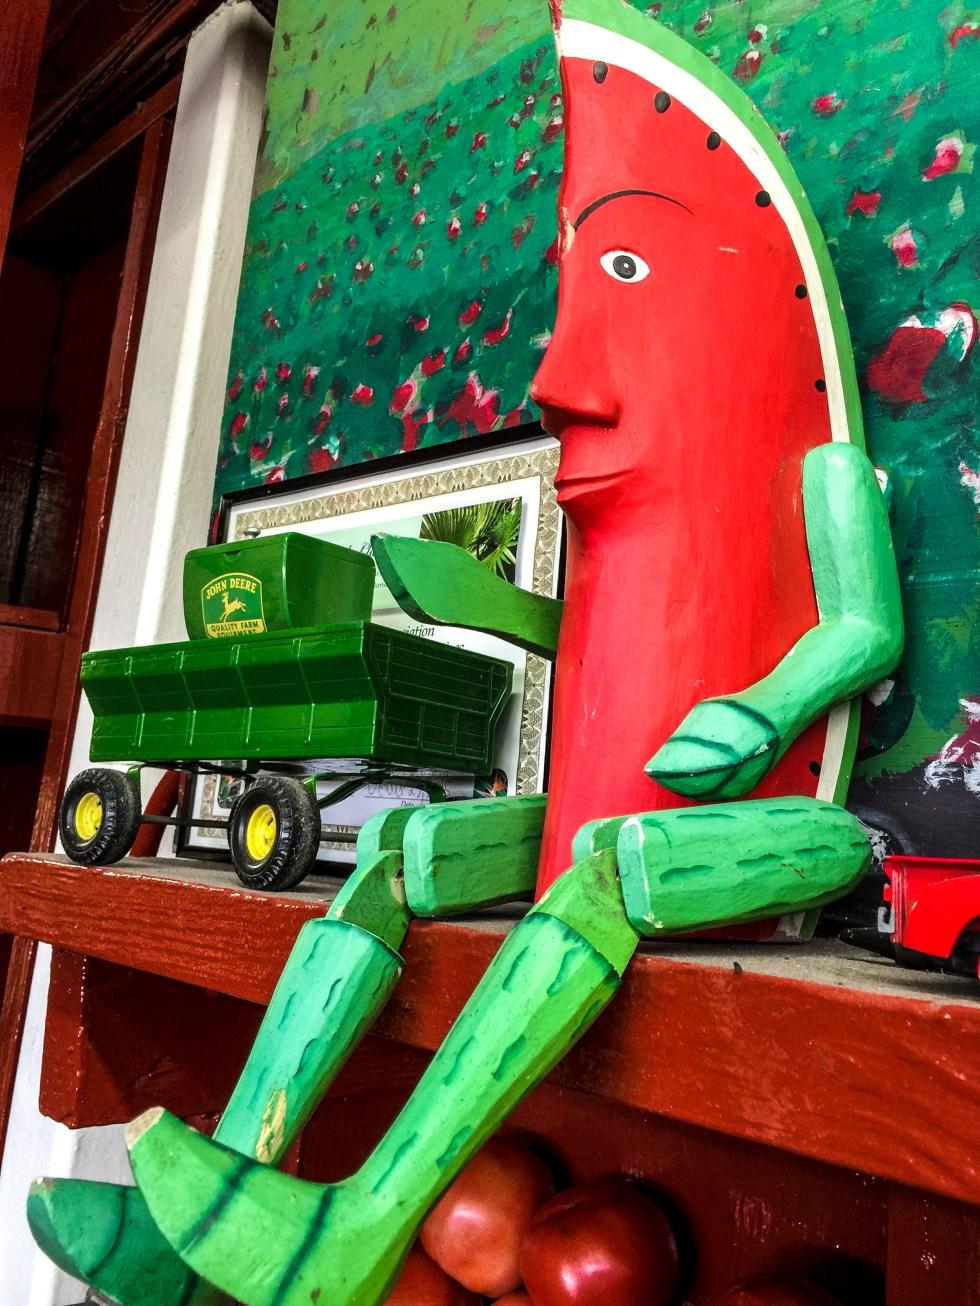 mr. watermelon man